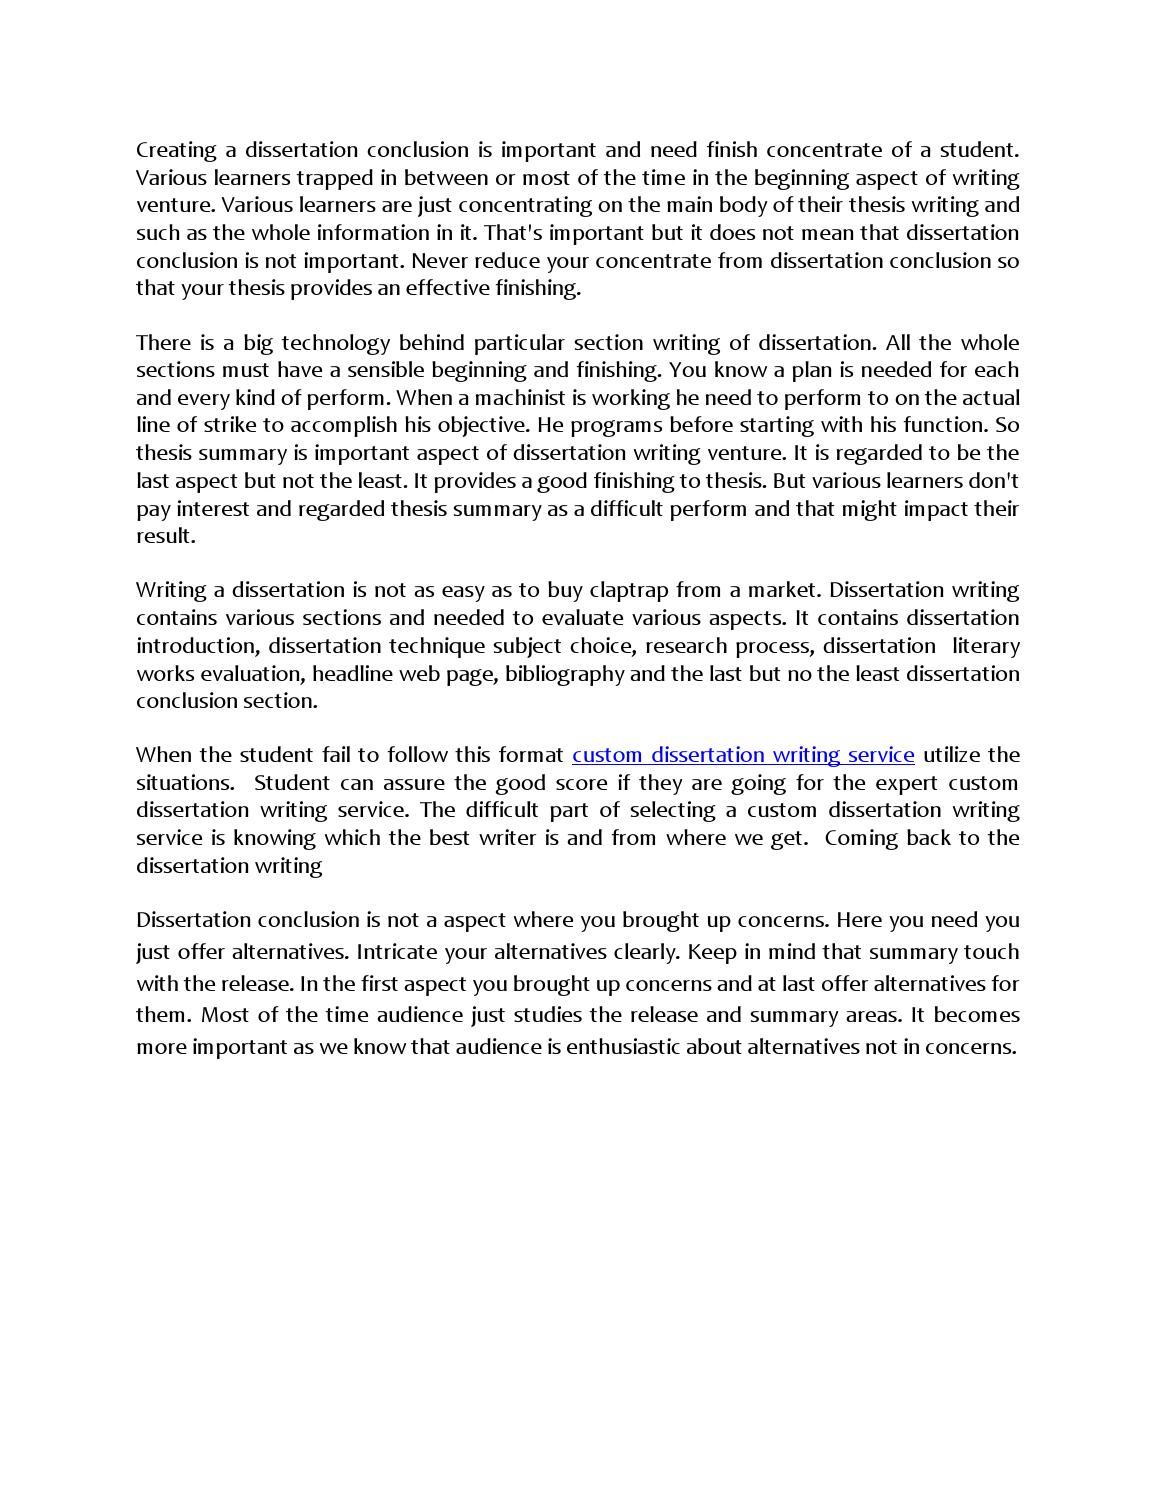 Dissertation assistance uk